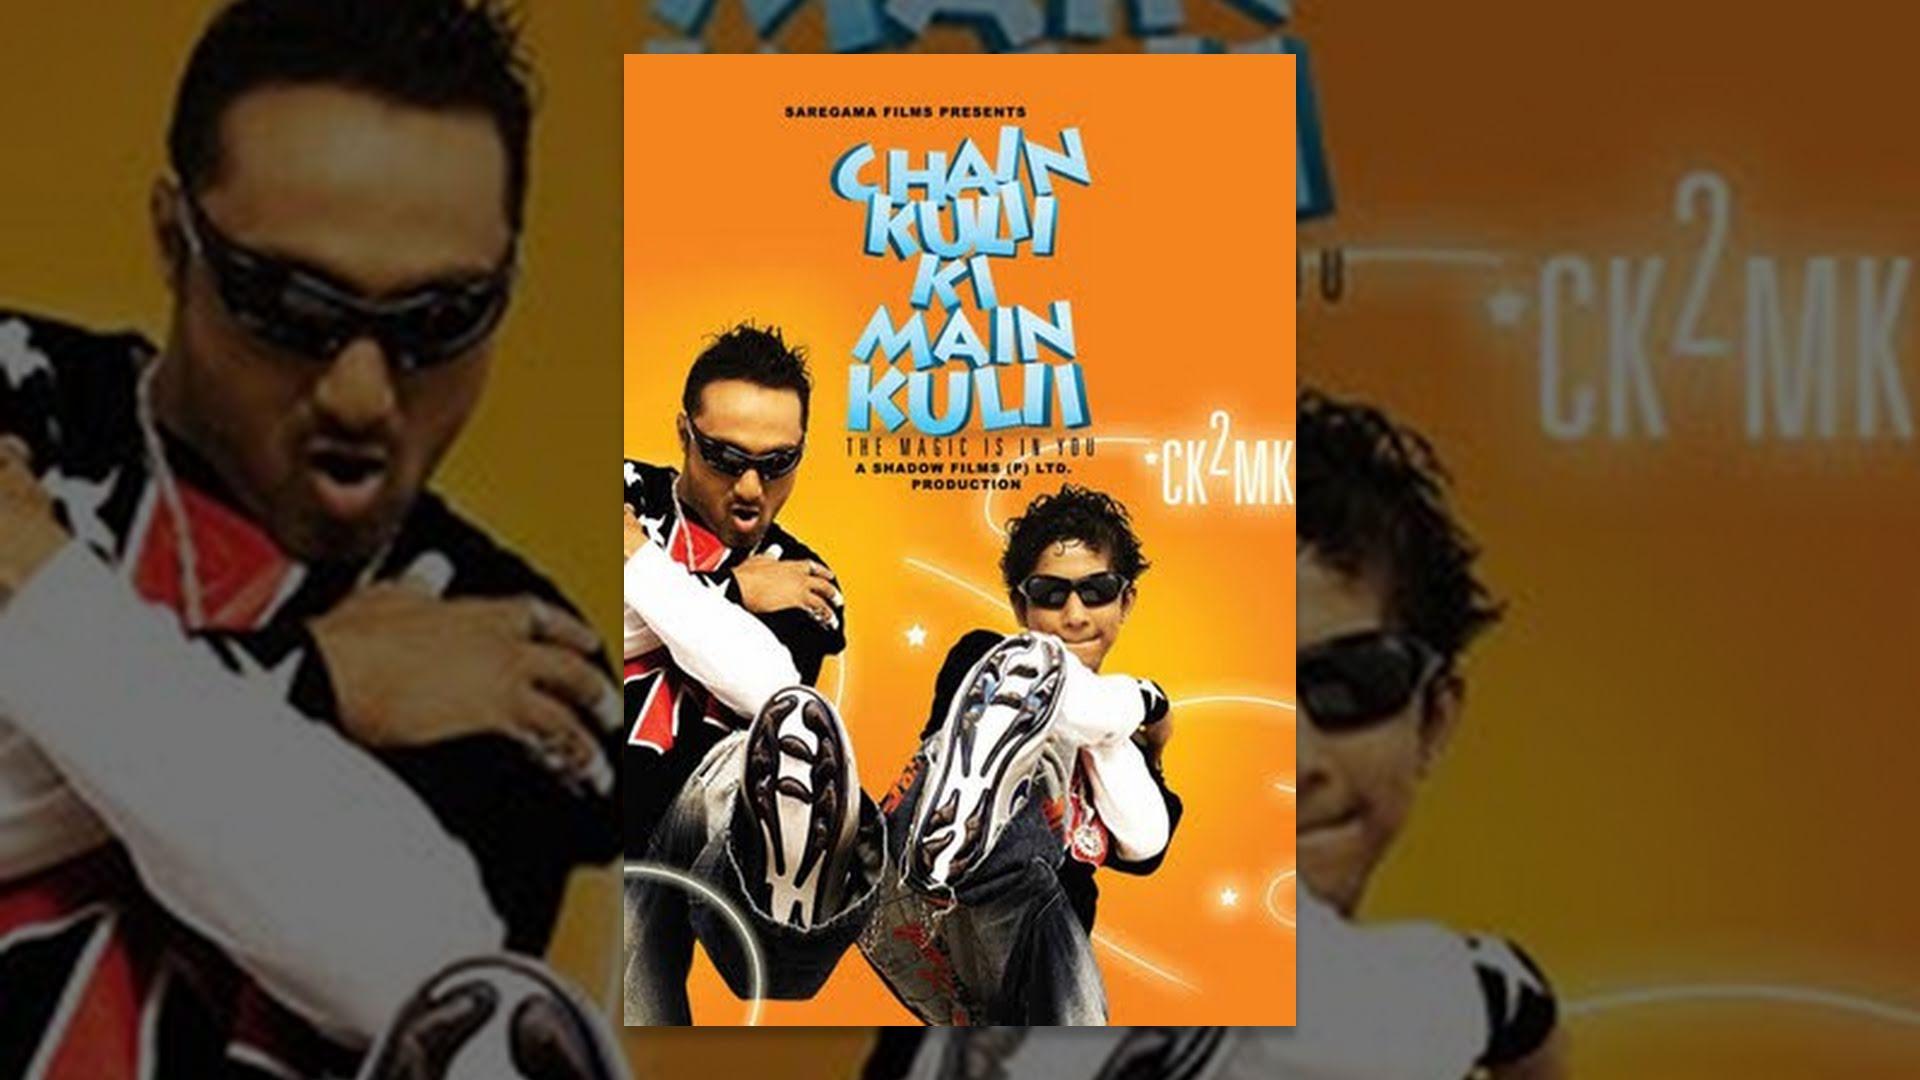 Chain Kulii Ki Main Kulii (2007)   Full Hindi Movie   Rahul Bose, Zain Khan